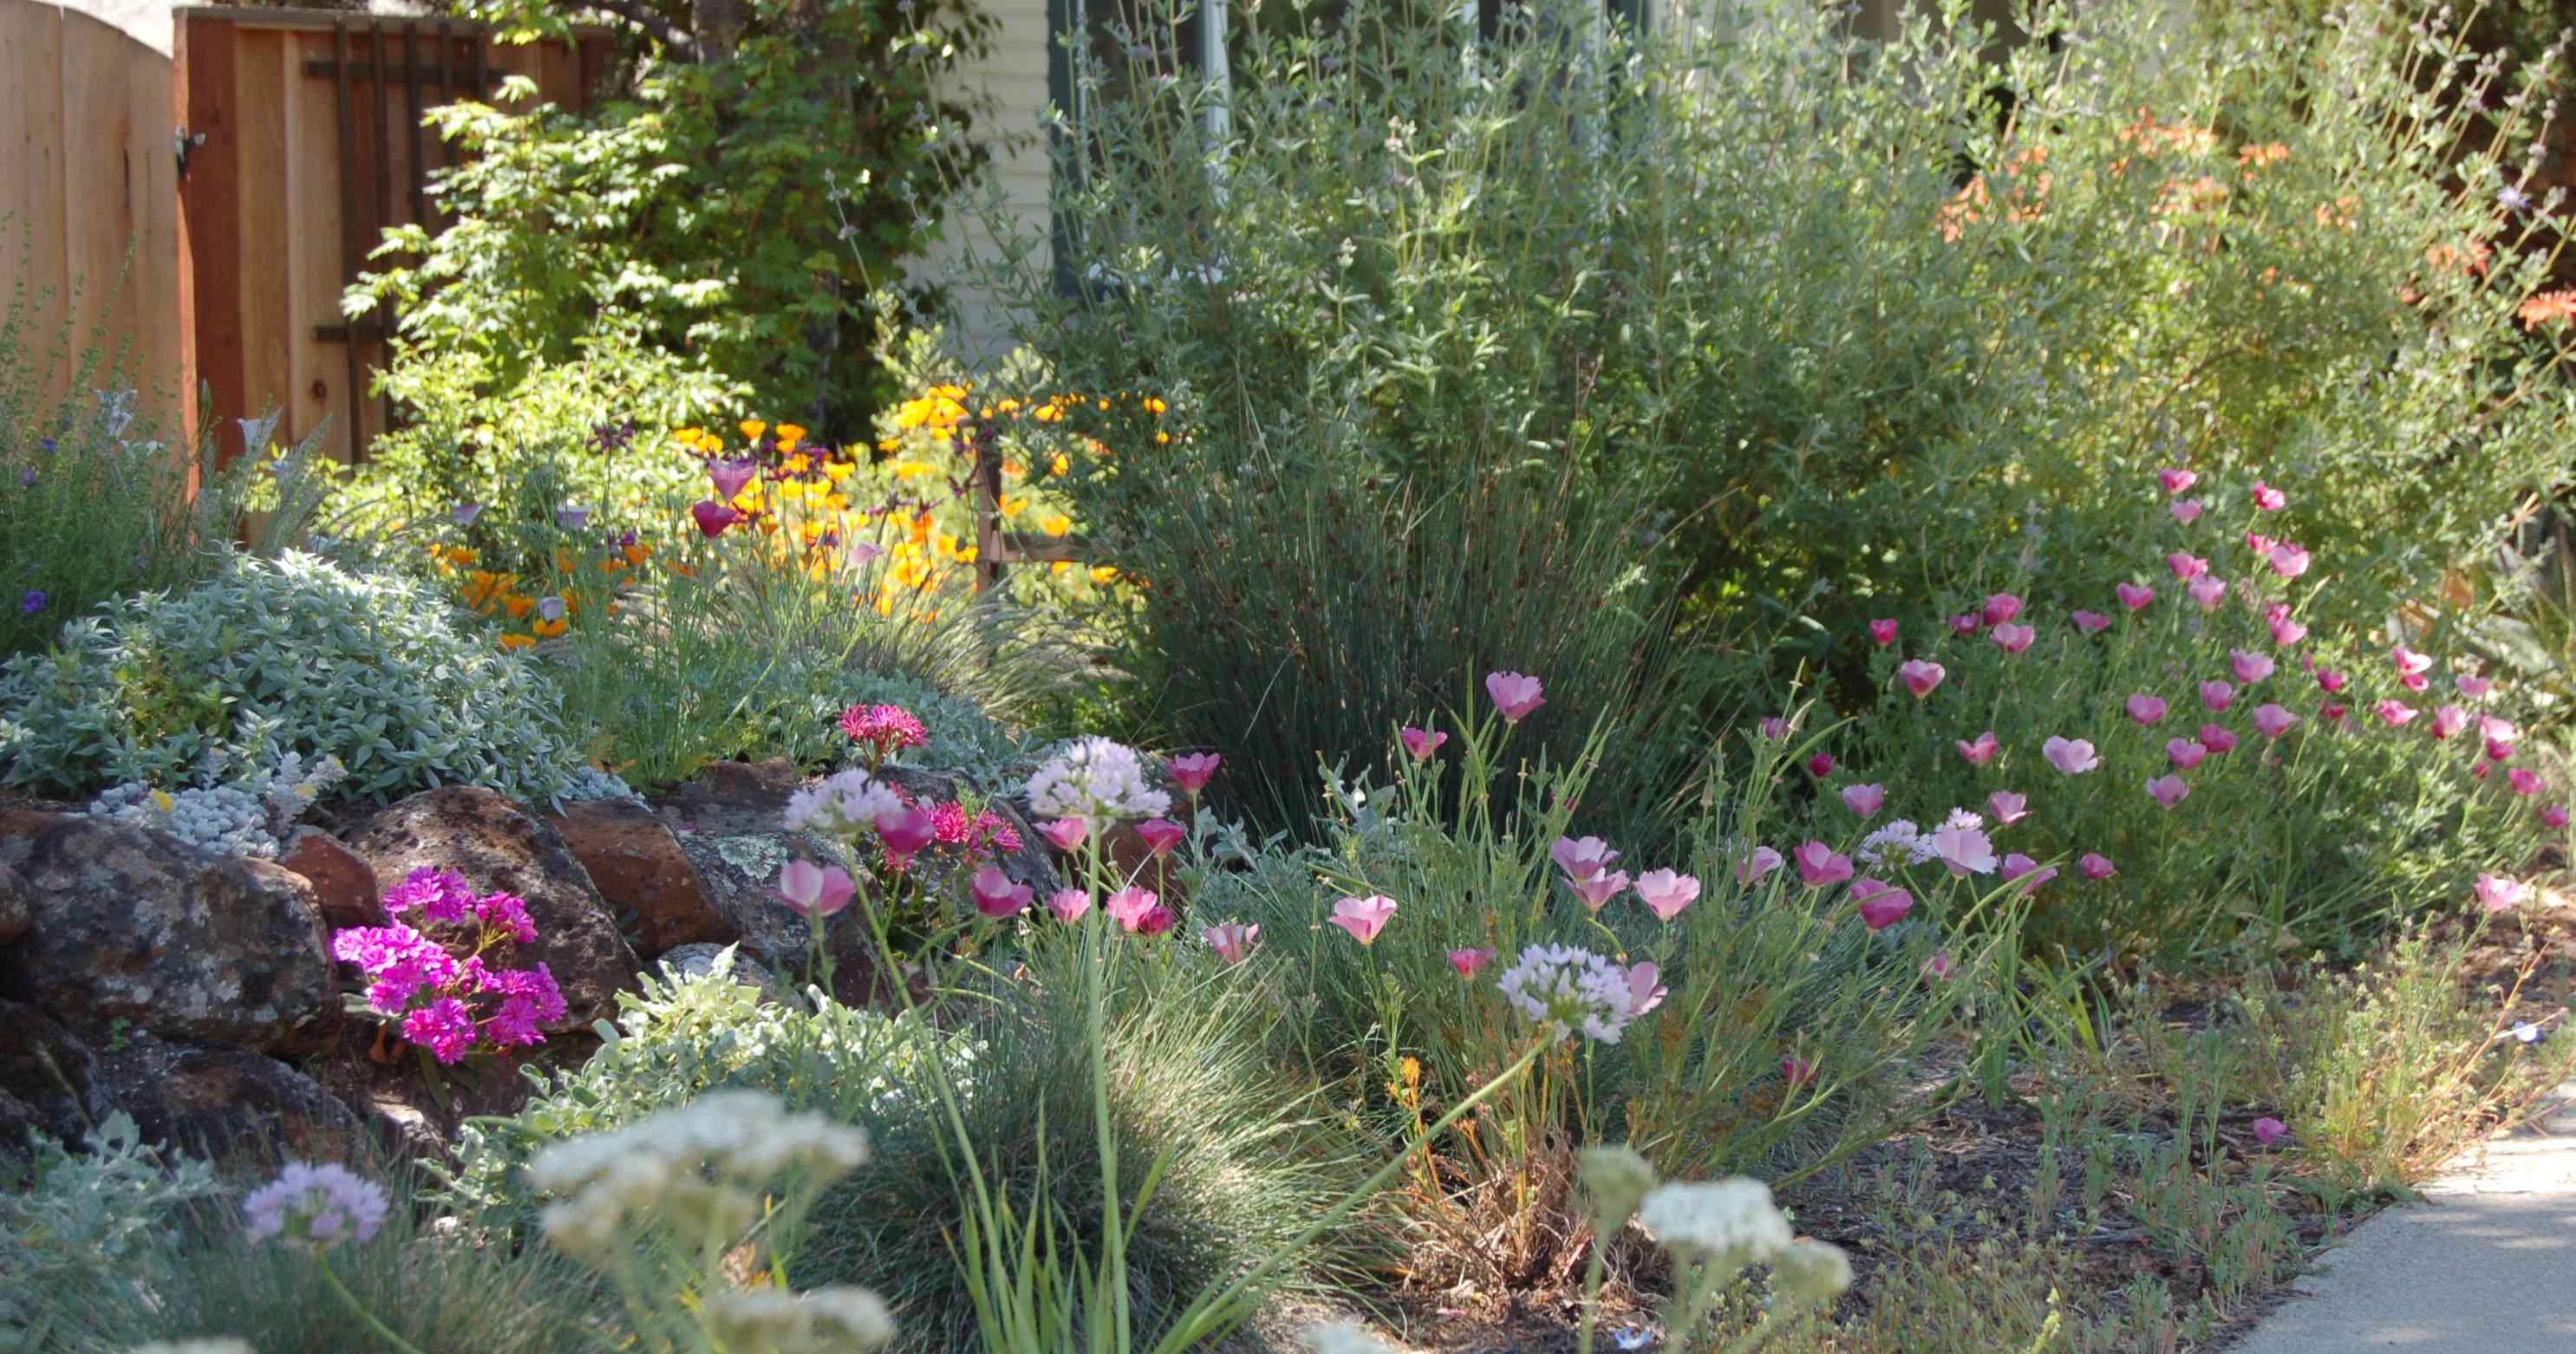 kelly marshall garden design specializing in beautiful california native low water garden designs interesting ideas for garden pinterest gardens